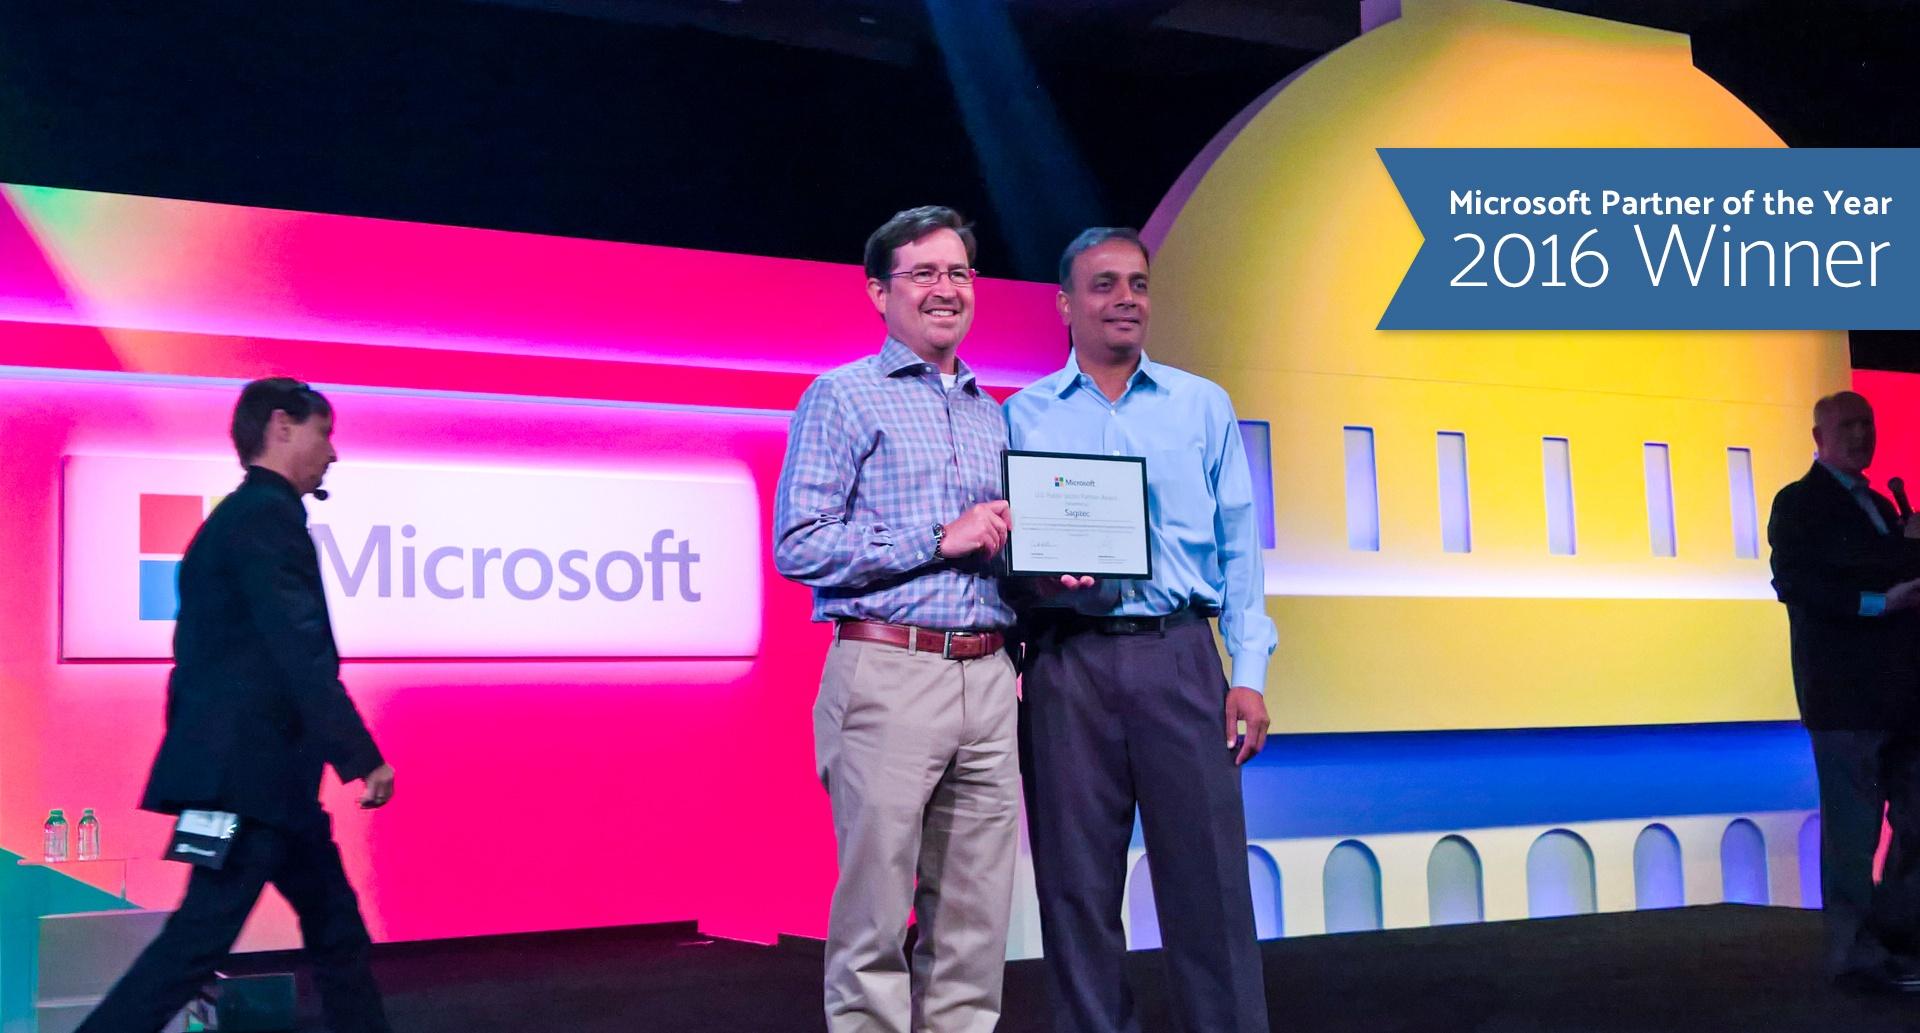 Microsoft-PoY-hero-graphic .jpg